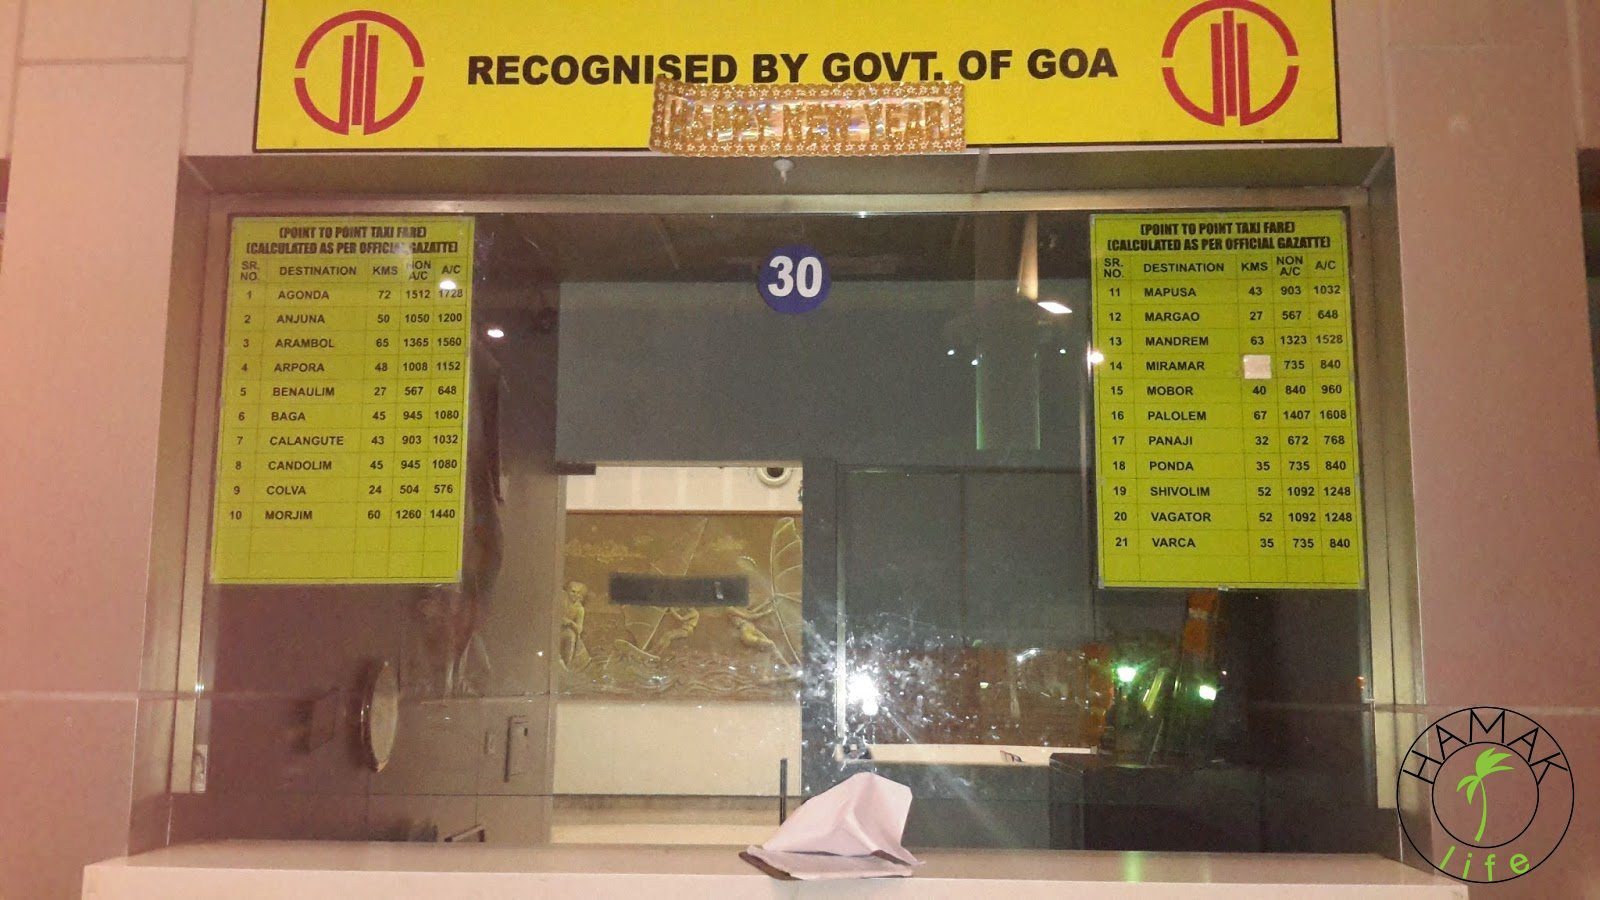 Droga do lotniska na Goa i lotnisko na Goa. Tablica informacyjna cen taksówek na Goa.